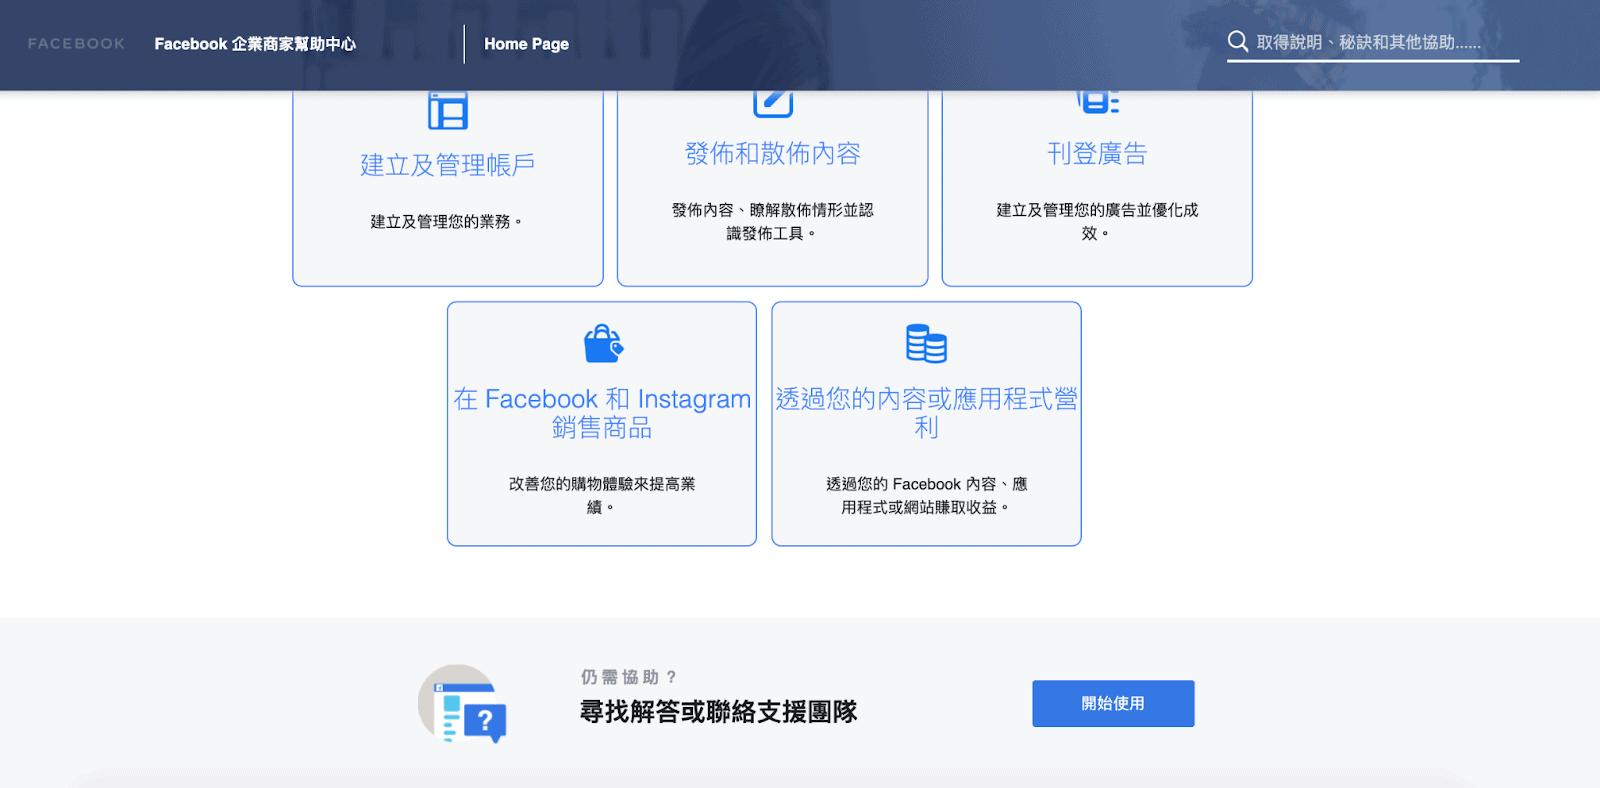 img 60d077c91b550 Facebook 商務管理平台(BM)/廣告帳戶被封鎖被封鎖、被停用的解決辦法(下):要求審查、聯絡客服、搬家